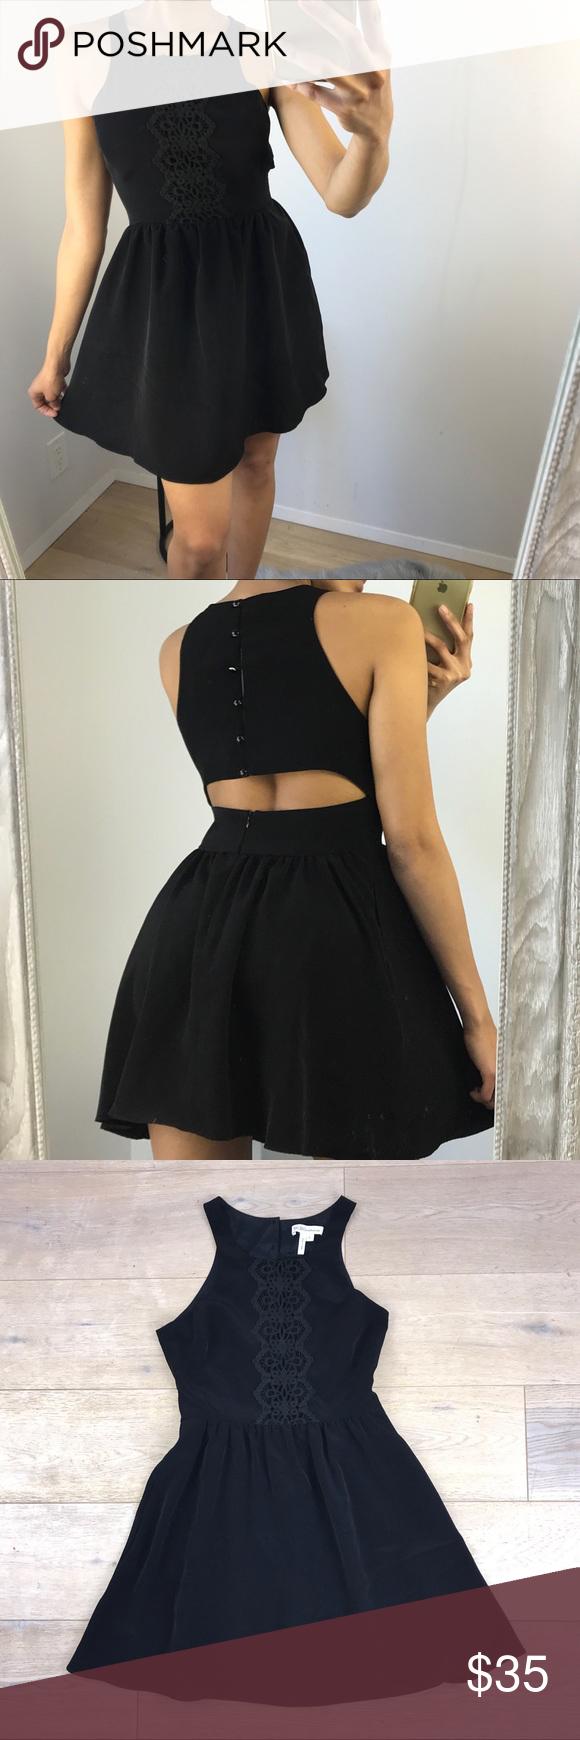 49+ Bcbgeneration long black dress trends